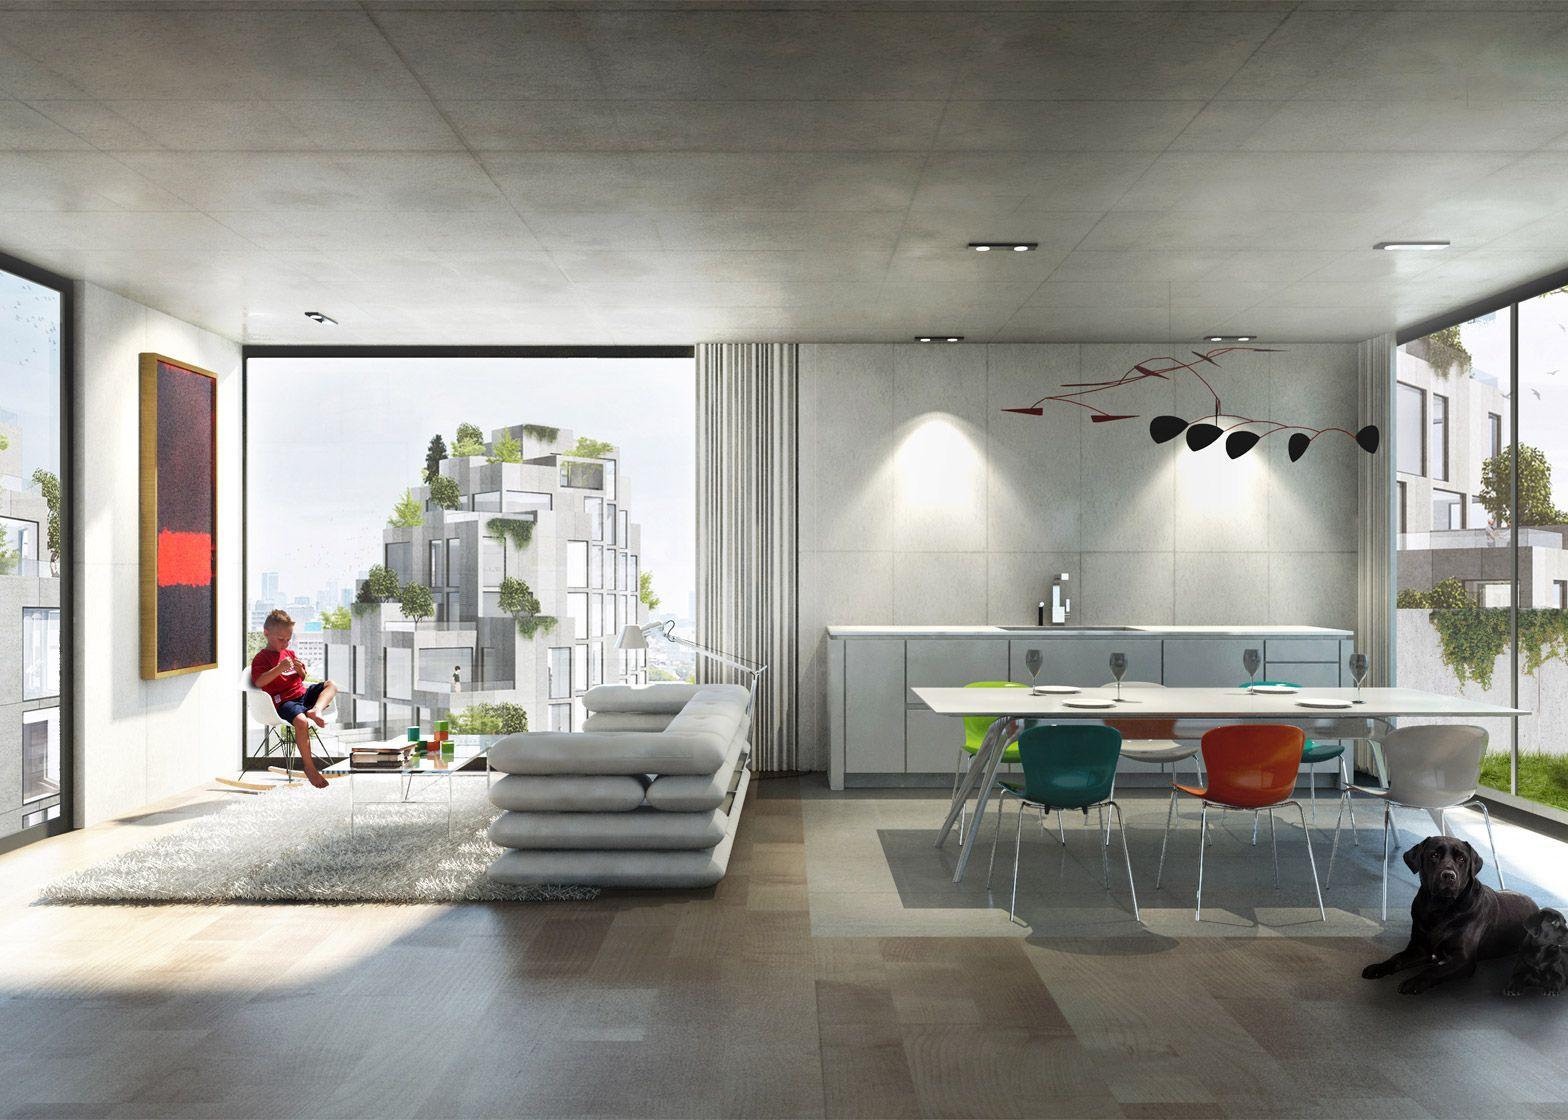 Habitat 2.0 BIG unveils new condo complex for Toronto